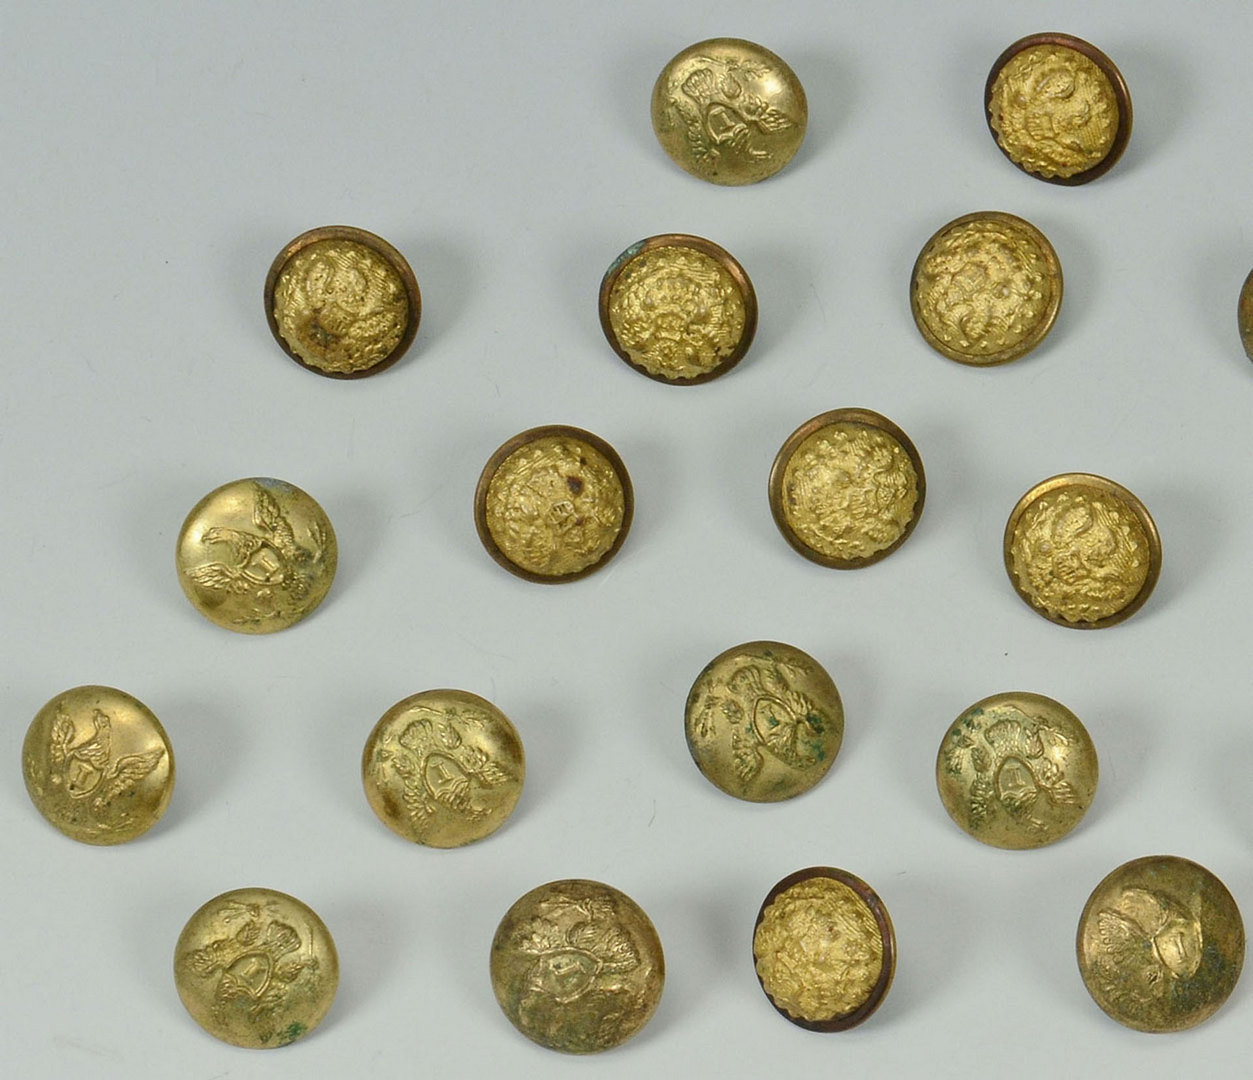 Lot 314: Civil War and Indian War Military Buttons